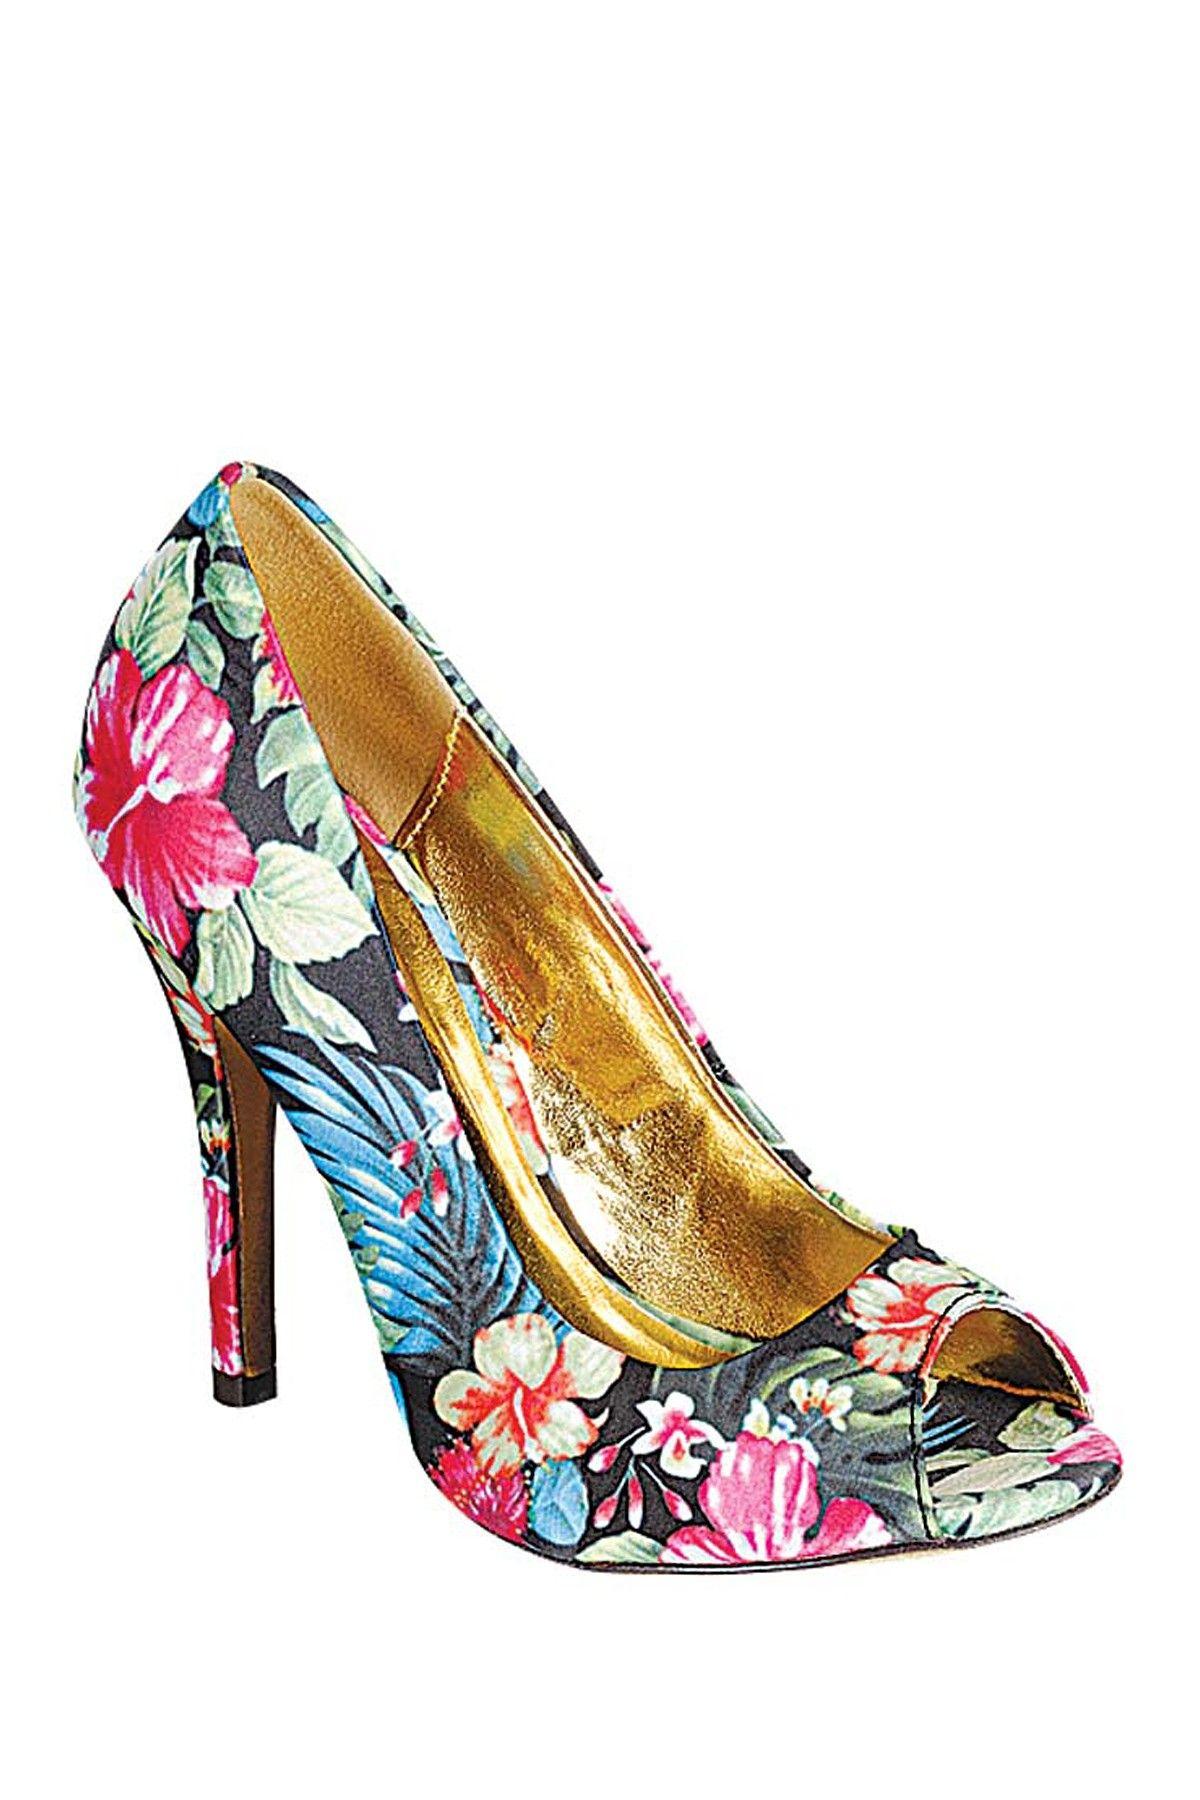 office shoes dublin. LILIANA | Dublin Peep Toe Pump Nordstrom Rack Office Shoes C